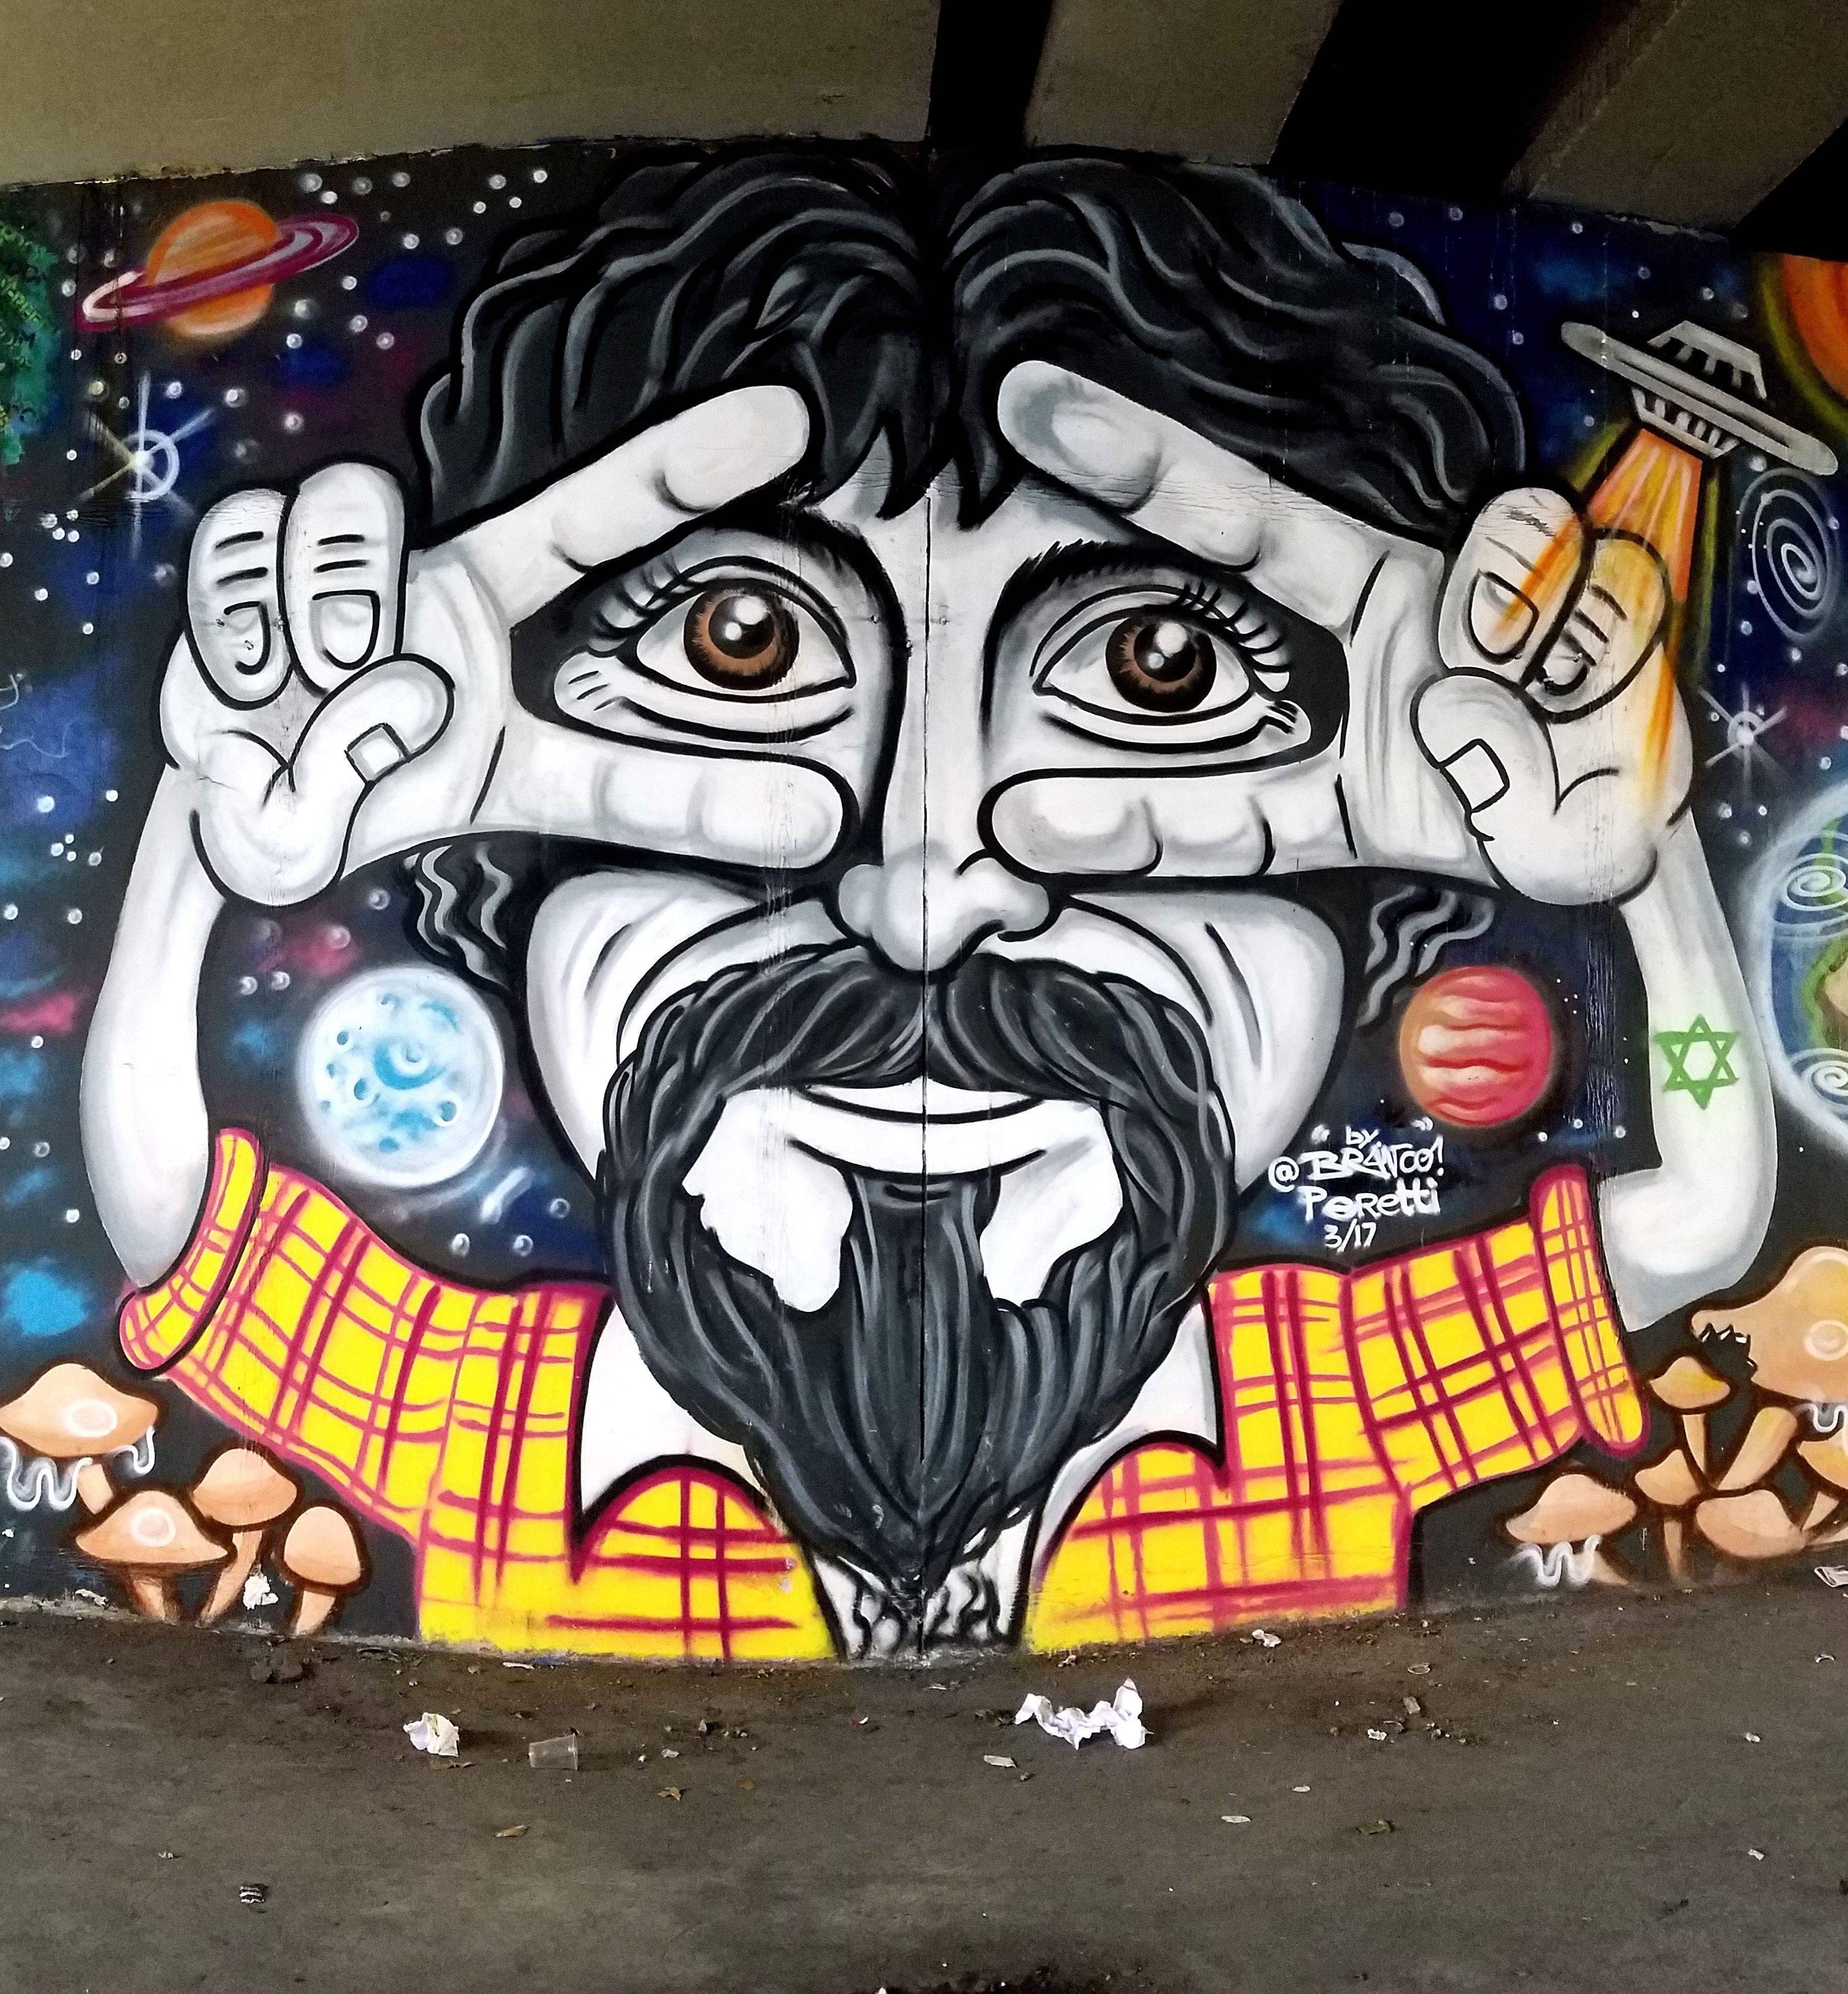 Sao Paulo Brasil Amazing Street Art Graffiti From The Avenida